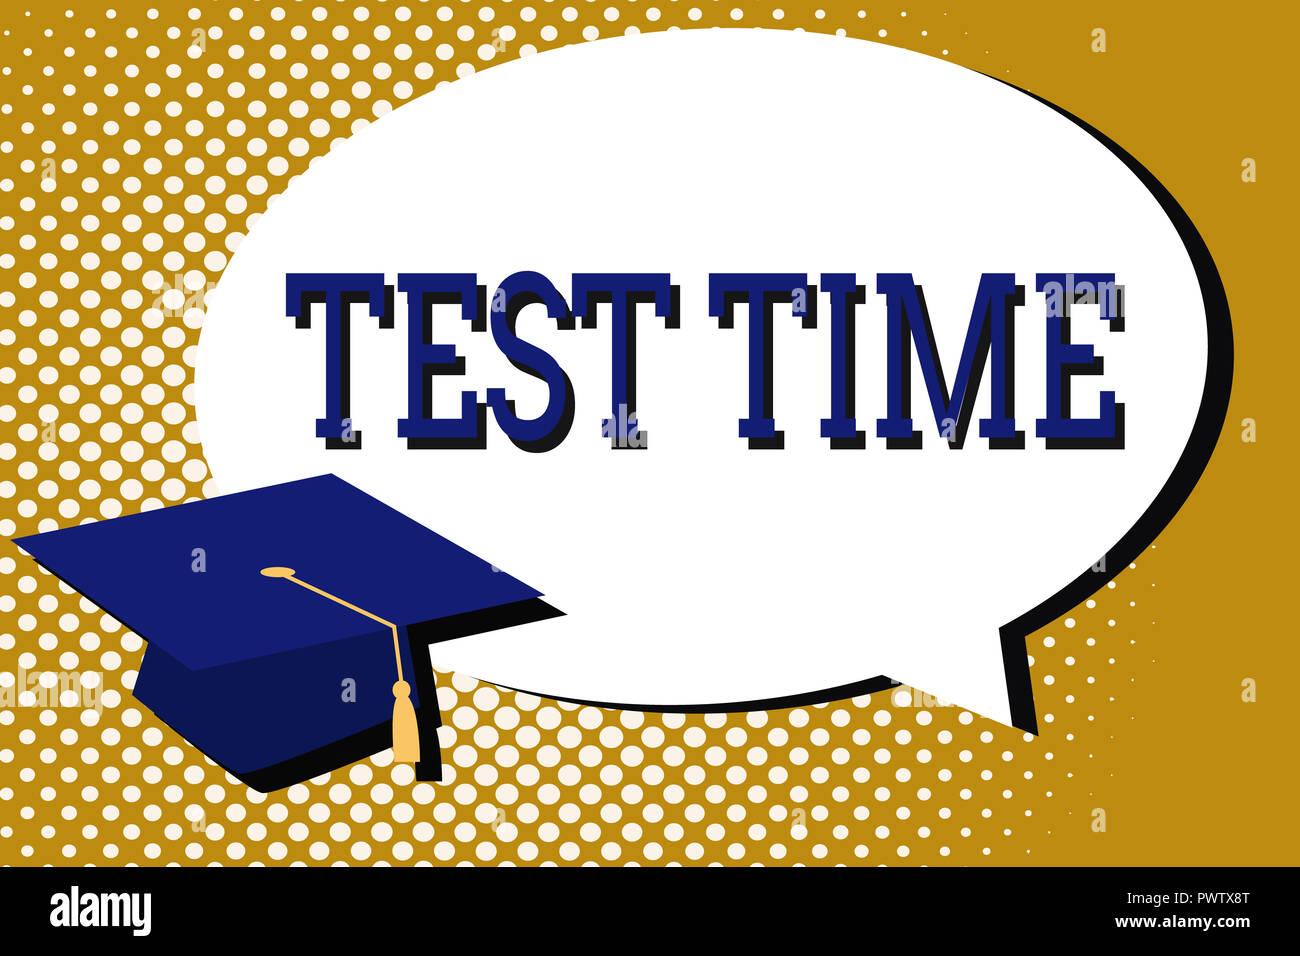 Assessment Inspection School Stock Photos Amp Assessment Inspection School Stock Images